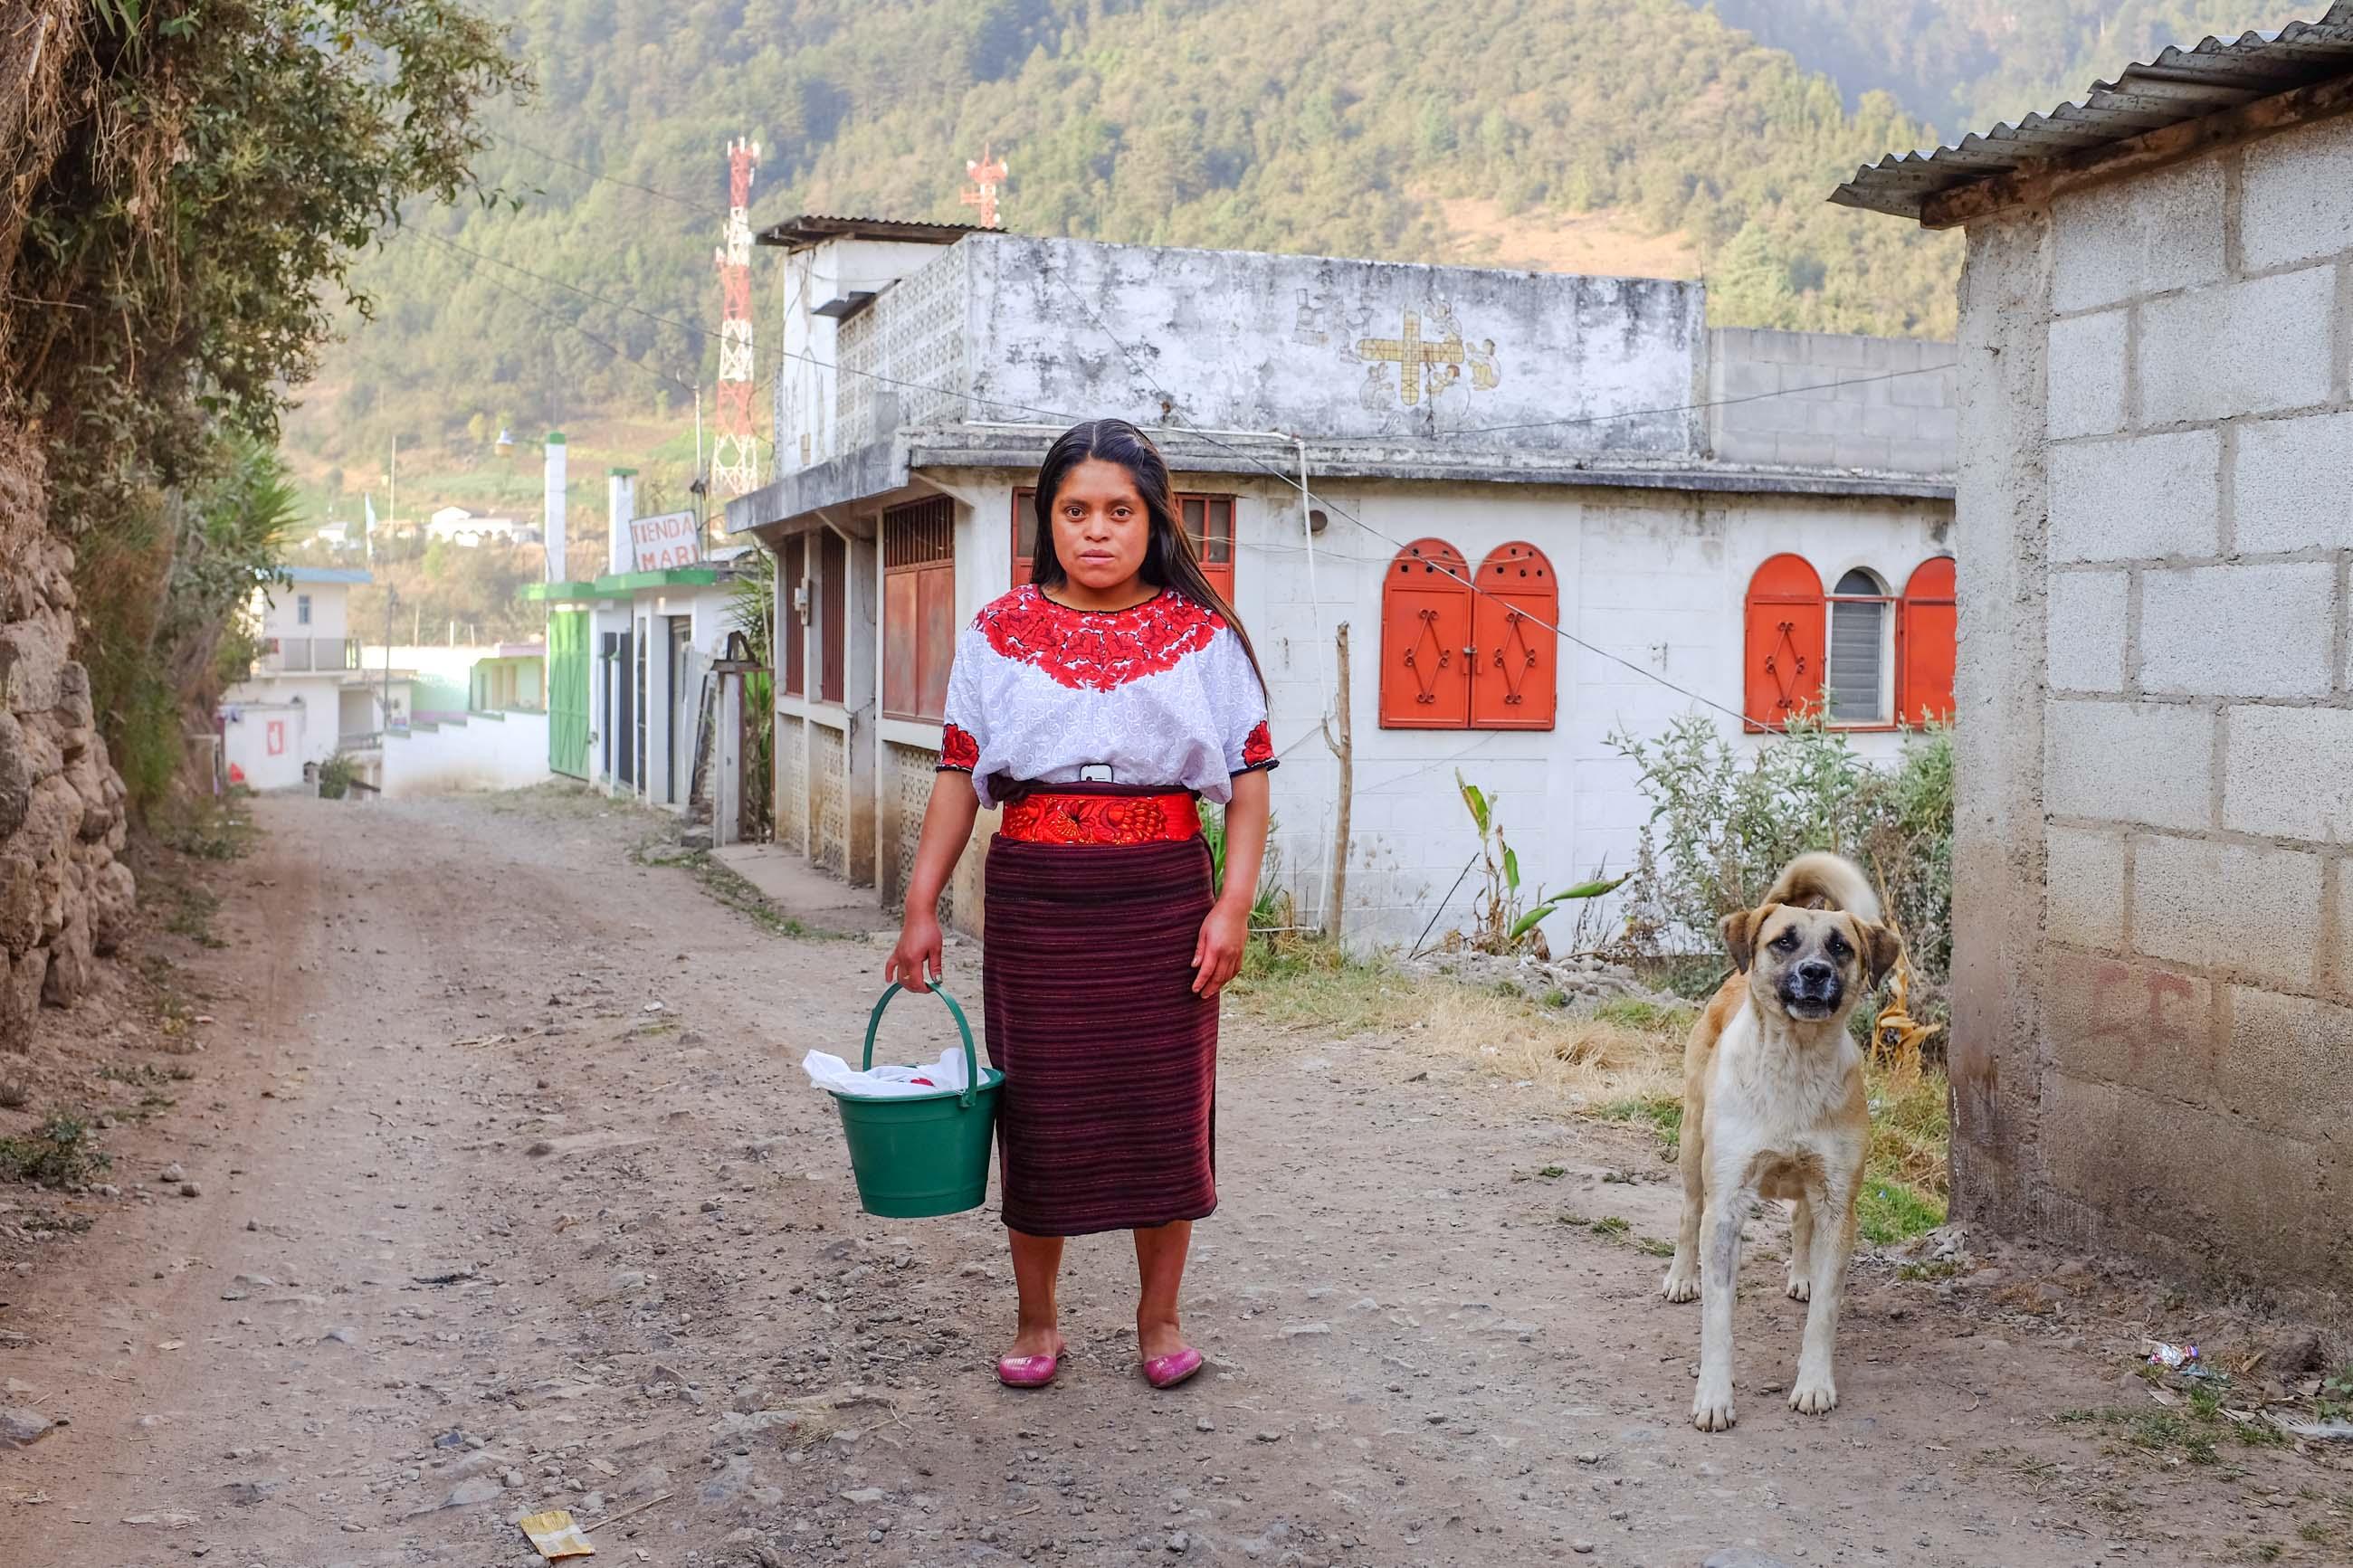 https://bubo.sk/uploads/galleries/7338/katkaliskovast_guatemala_-59-.jpg